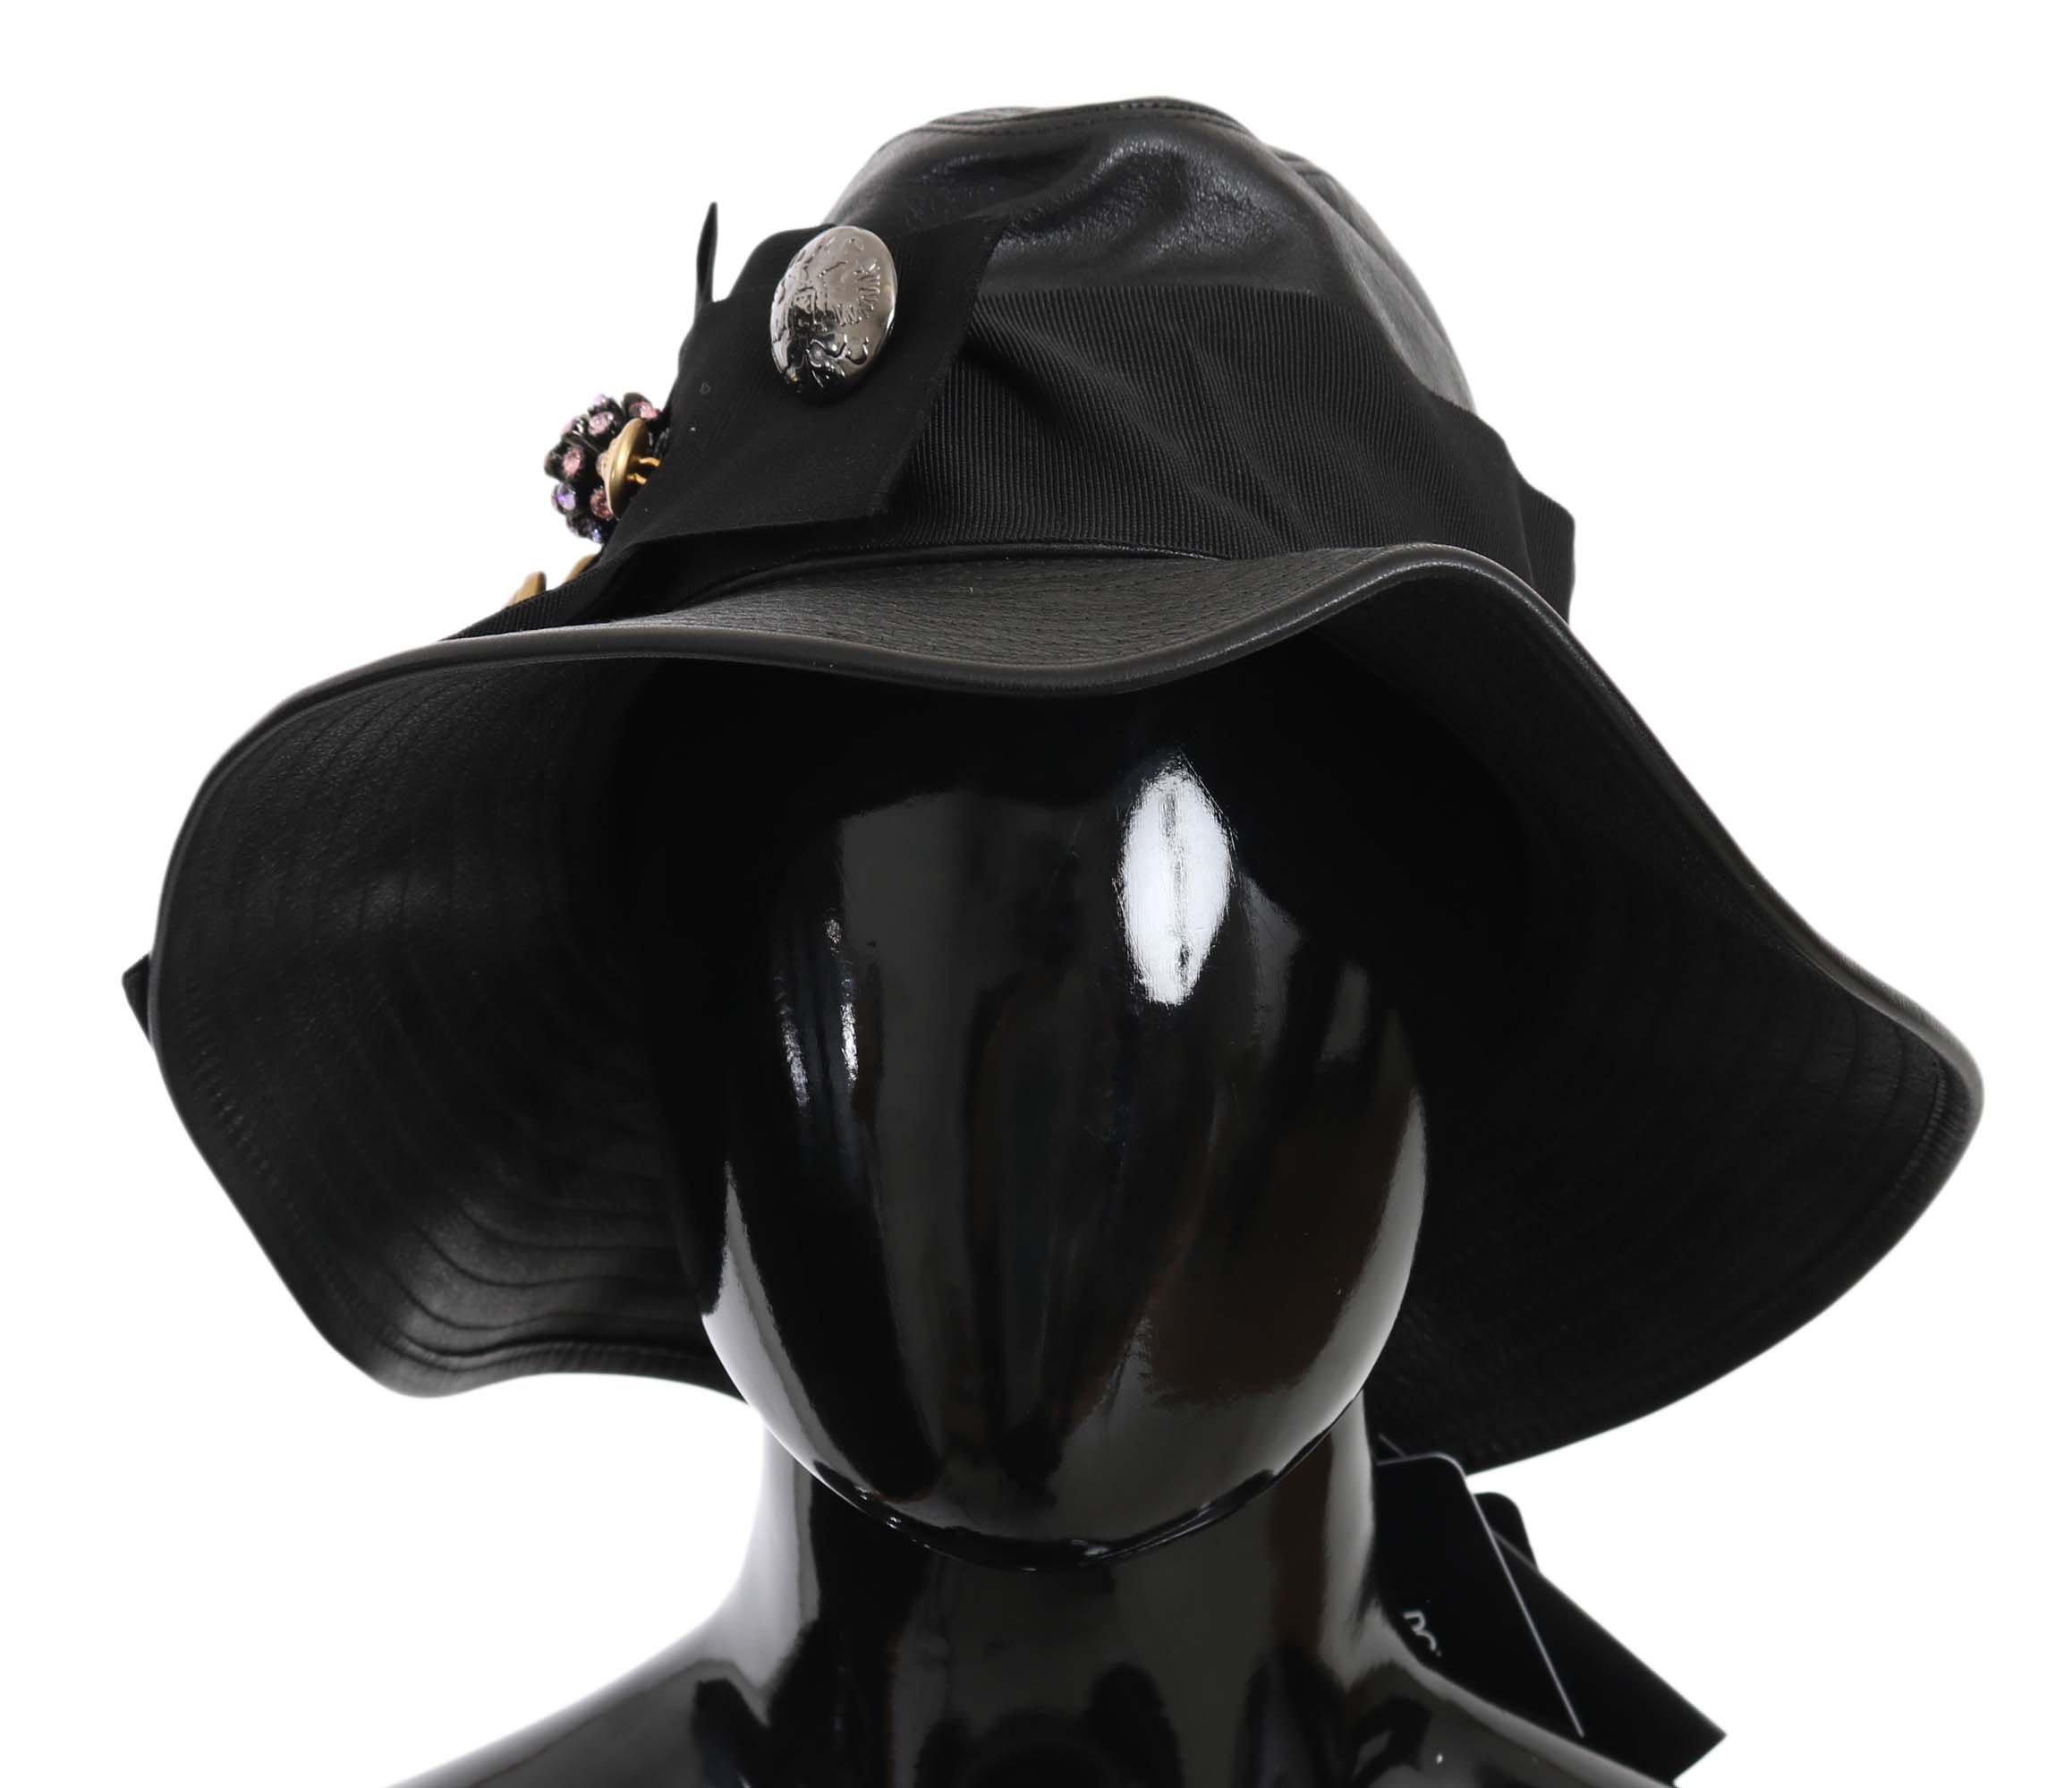 Dolce & Gabbana Women's Hat Black HAT70222 - 58 cm|M